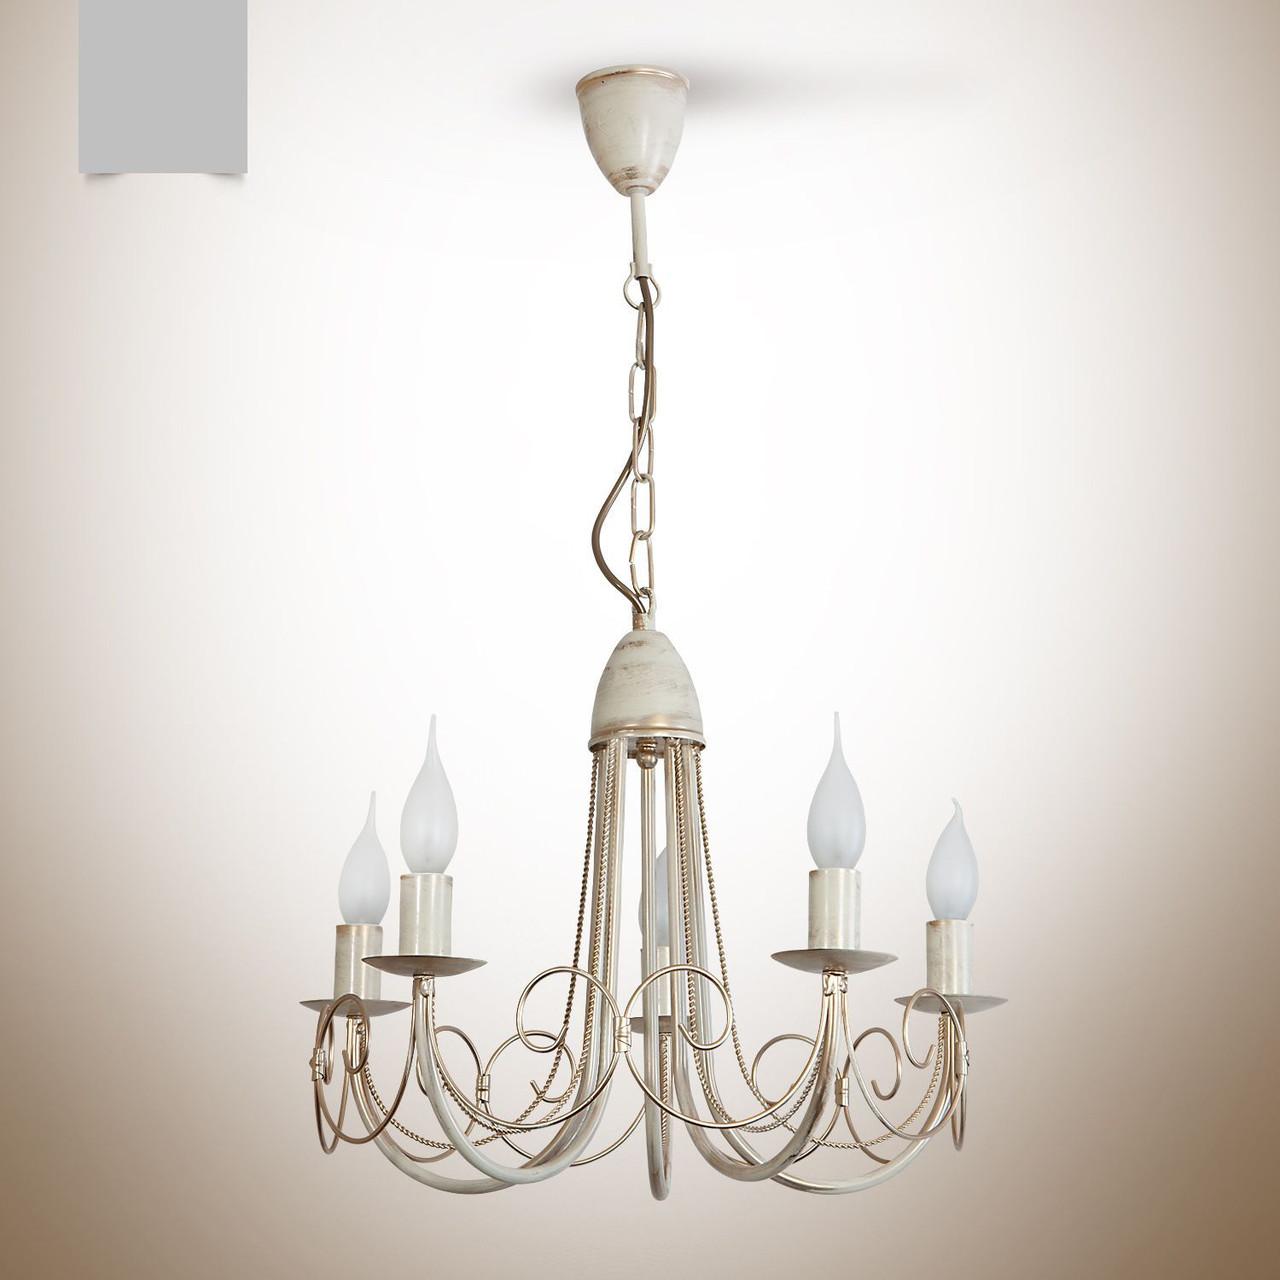 Люстра кованная 5 ламповая для спальни, зала, небольшой комнаты 14777